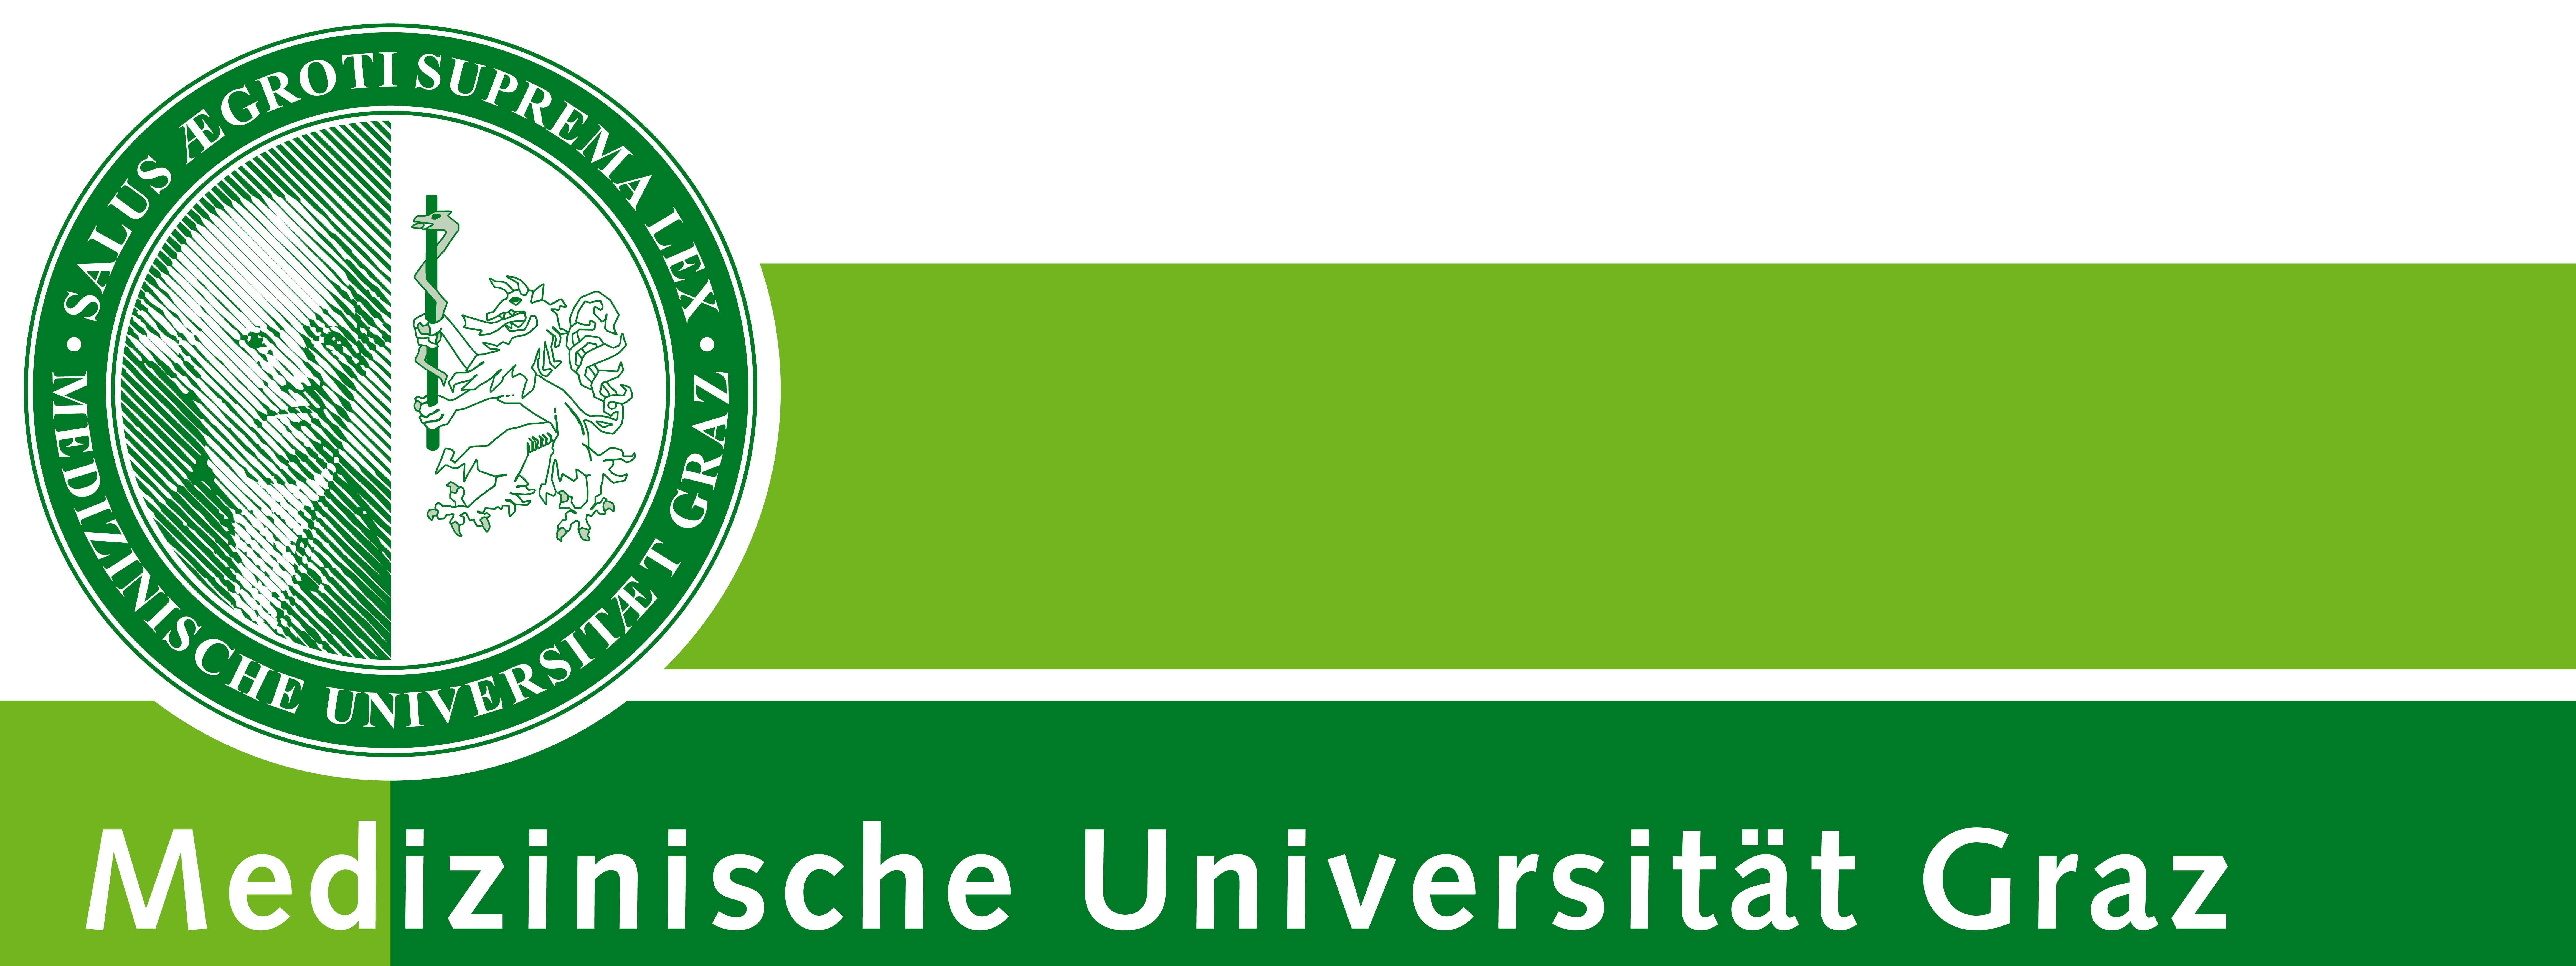 http://www.agn.at/kongress/wp-content/uploads/2015/12/MedUniGraz-Logo-dt-schmal.jpg